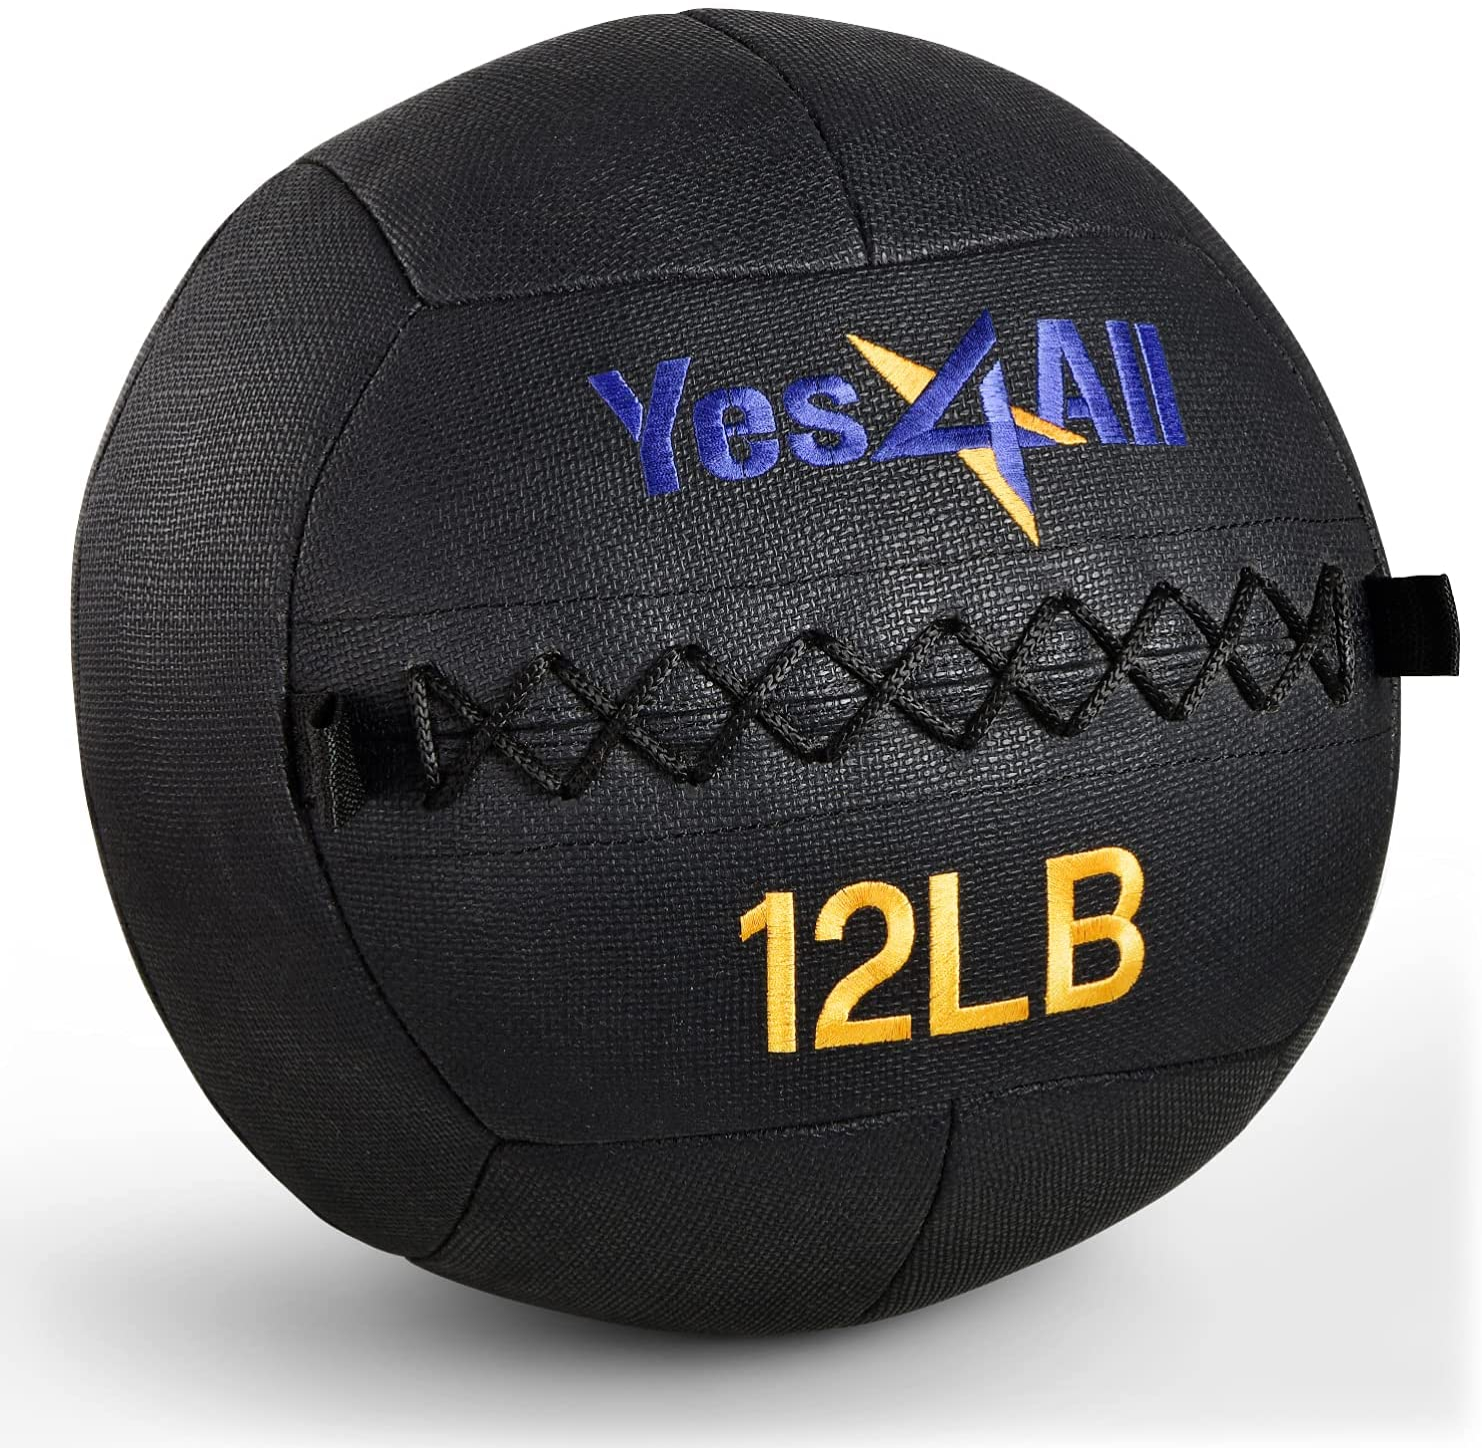 Yes4All Wall Ball free shipping Selling rankings Vibrant Blue Camo - Black Soft Ba Medicine